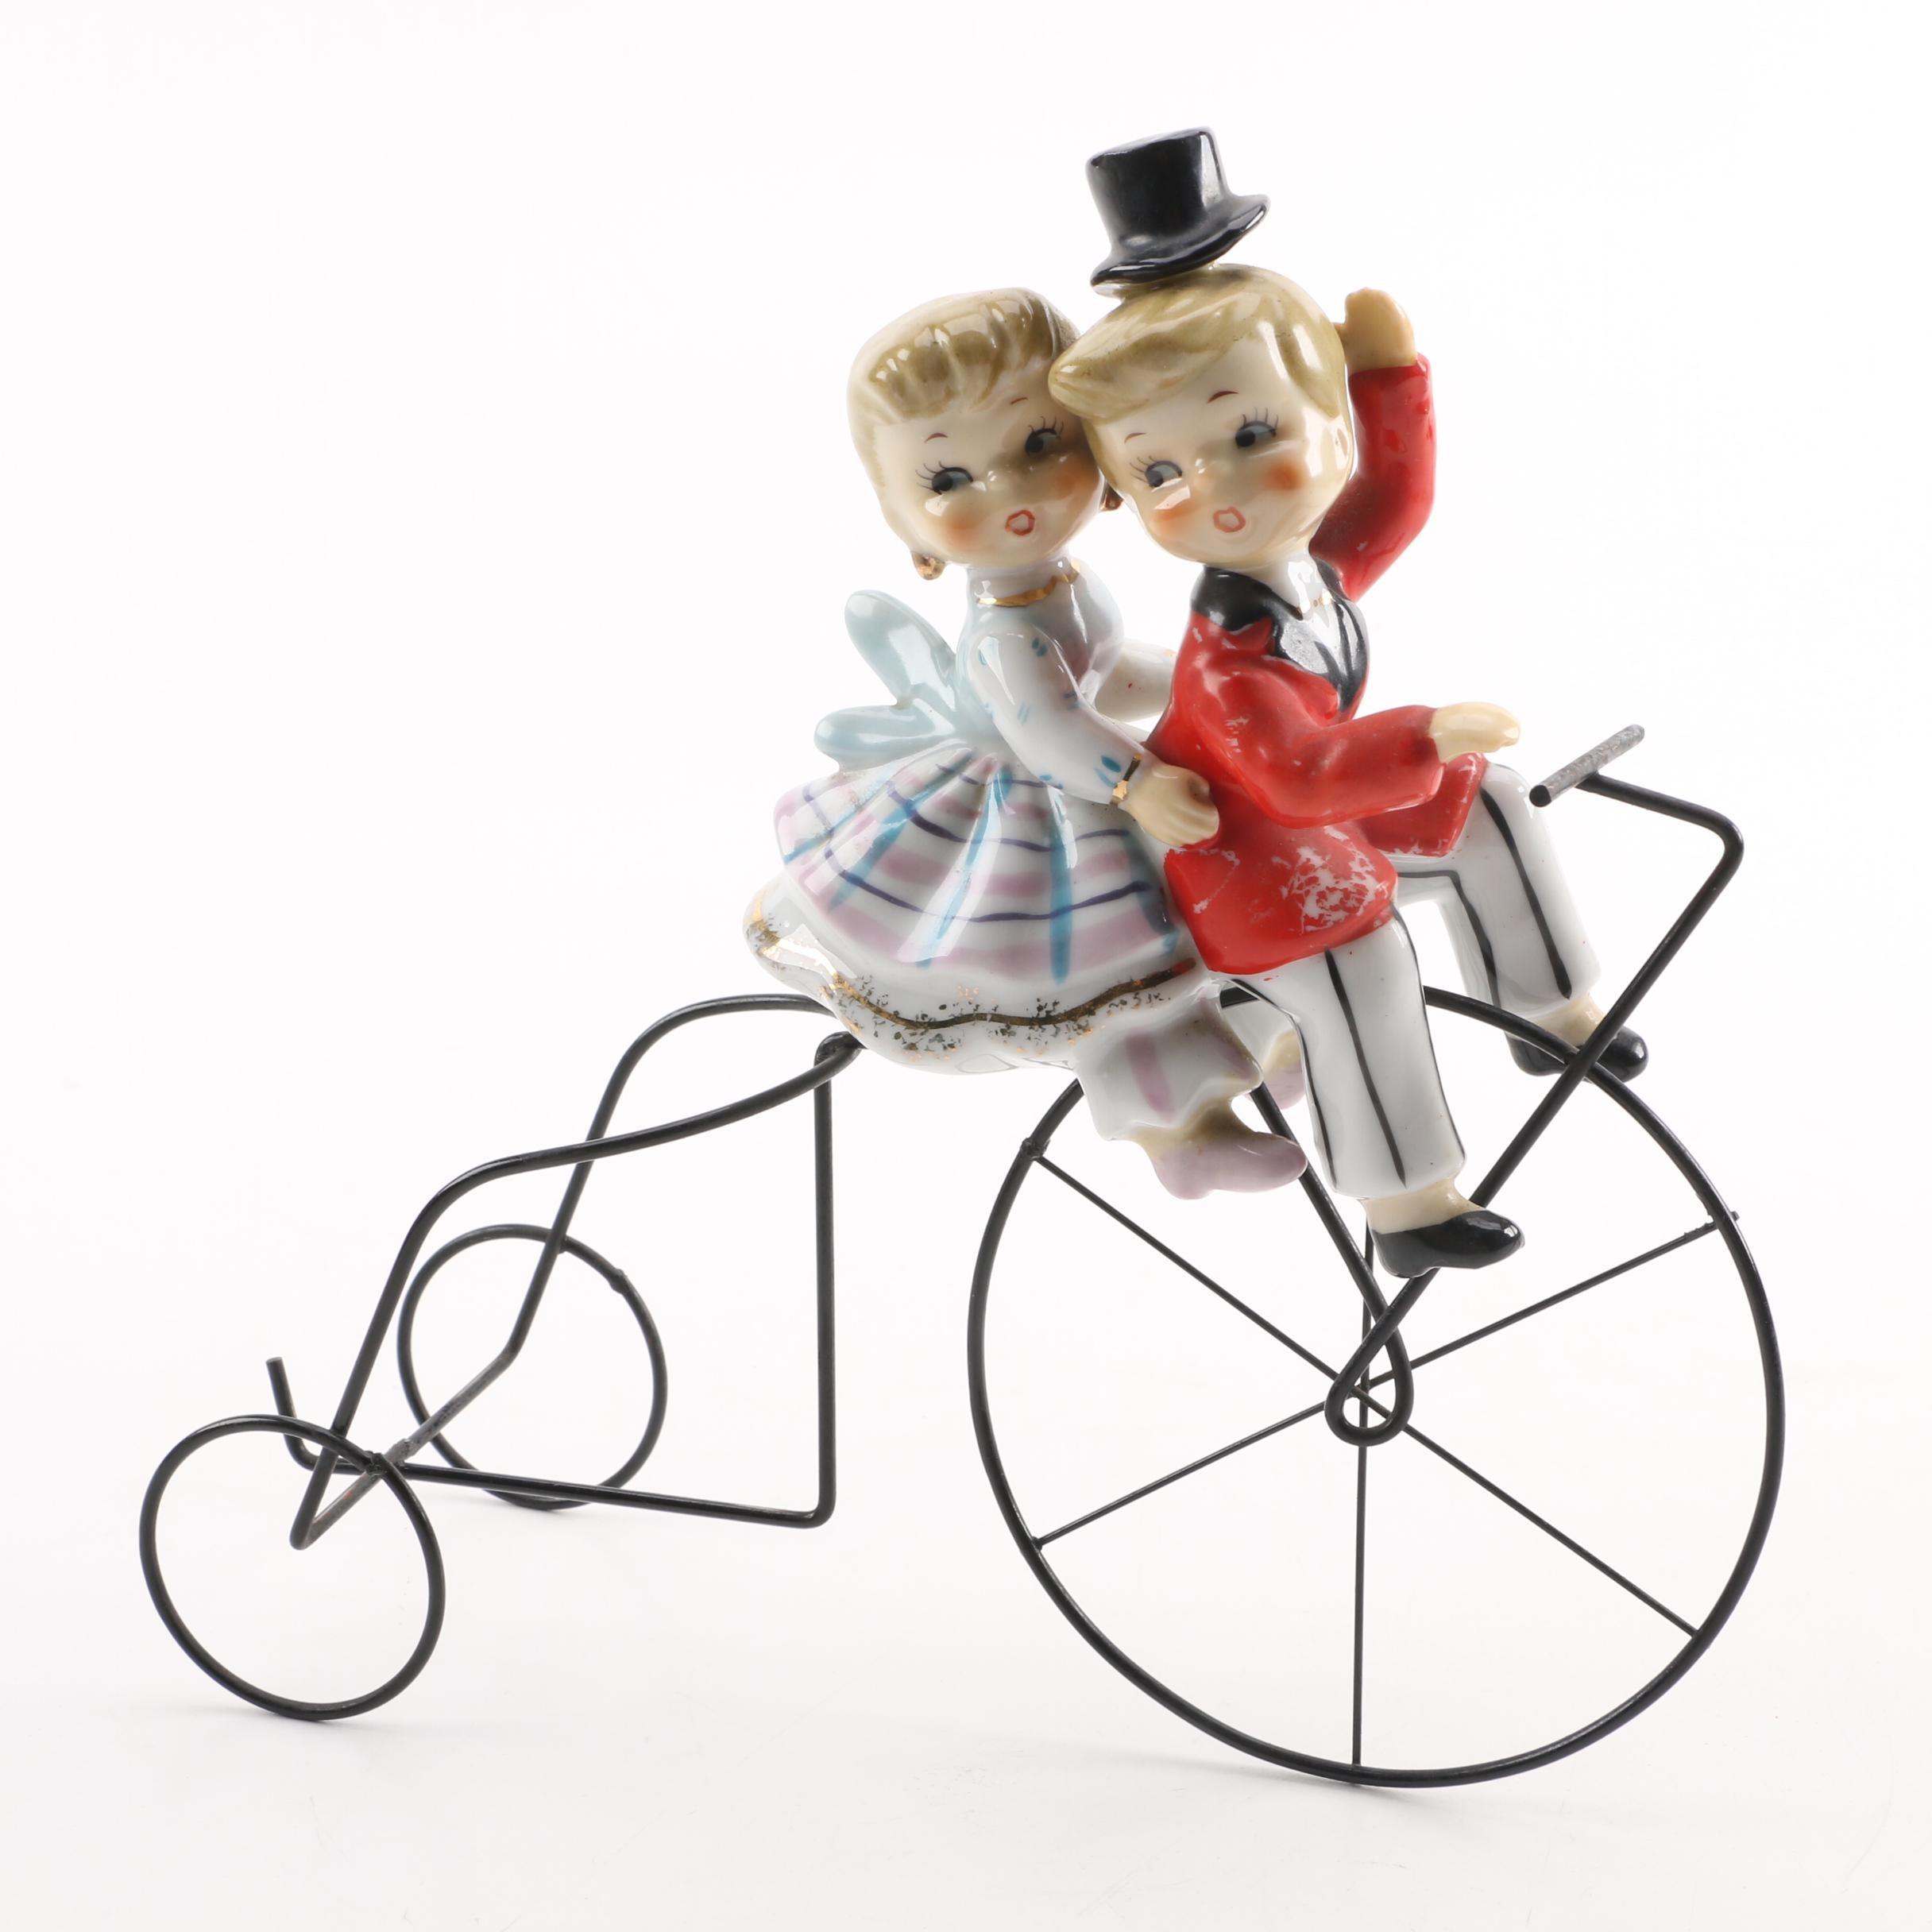 Boy and Girl Ceramic Figurines on Metal Bike